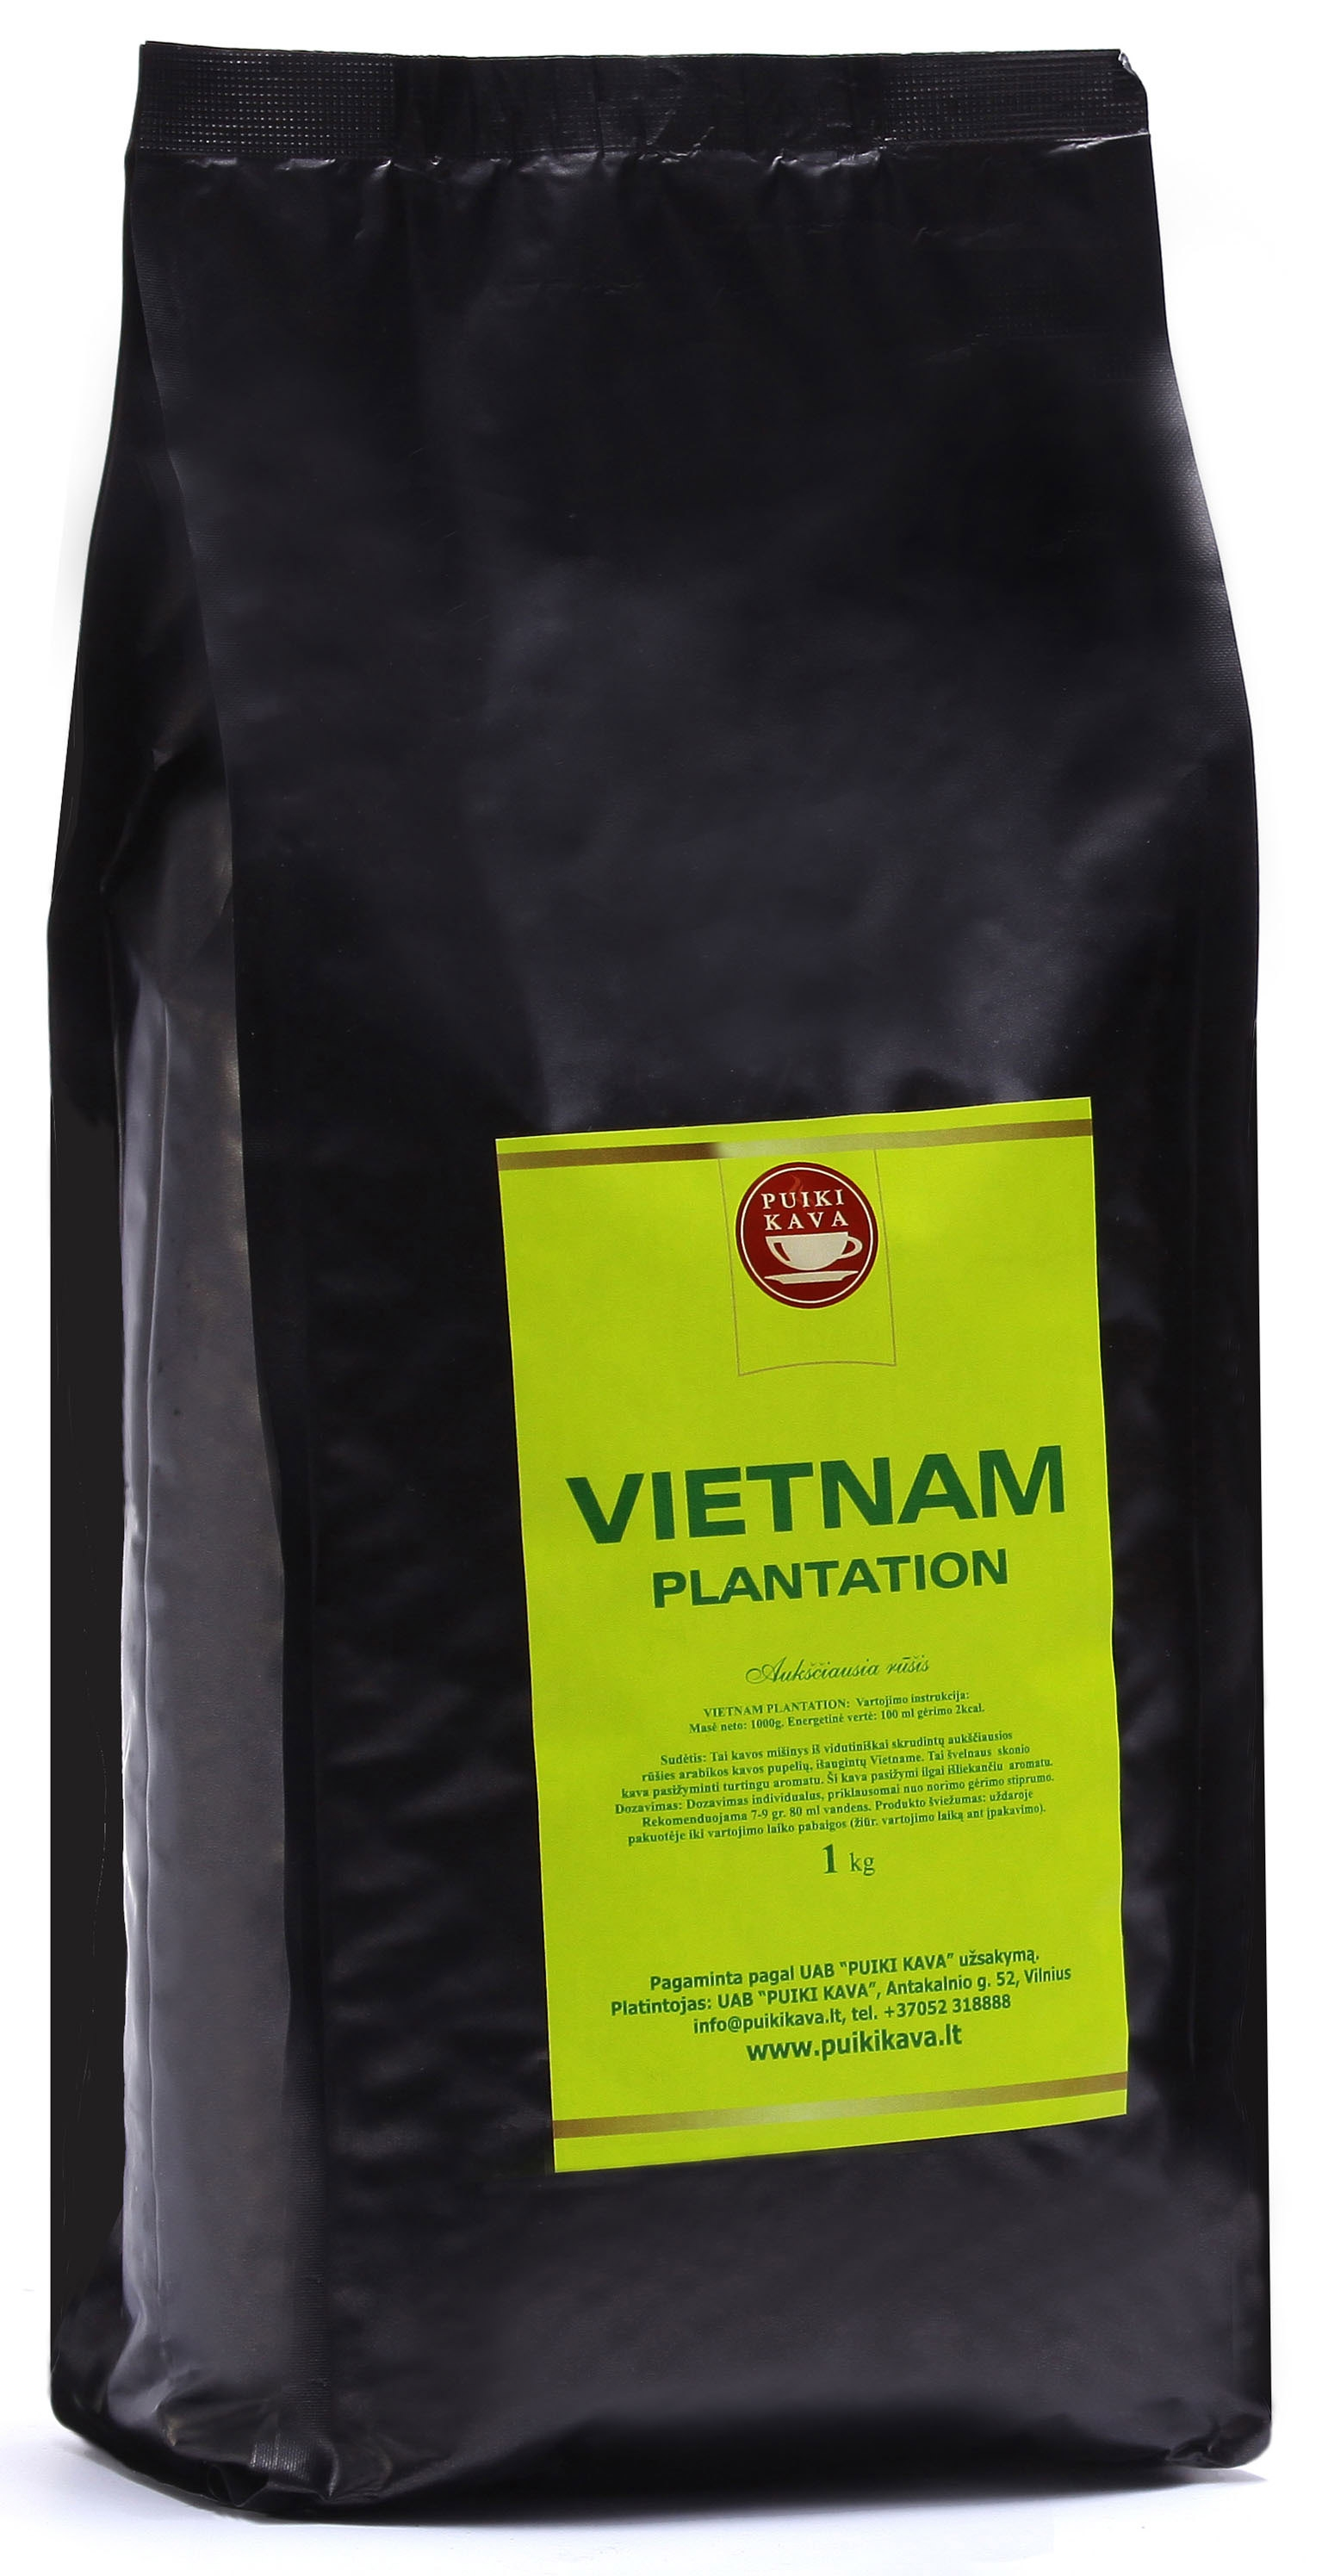 Vietnam Plantation (1 kg)